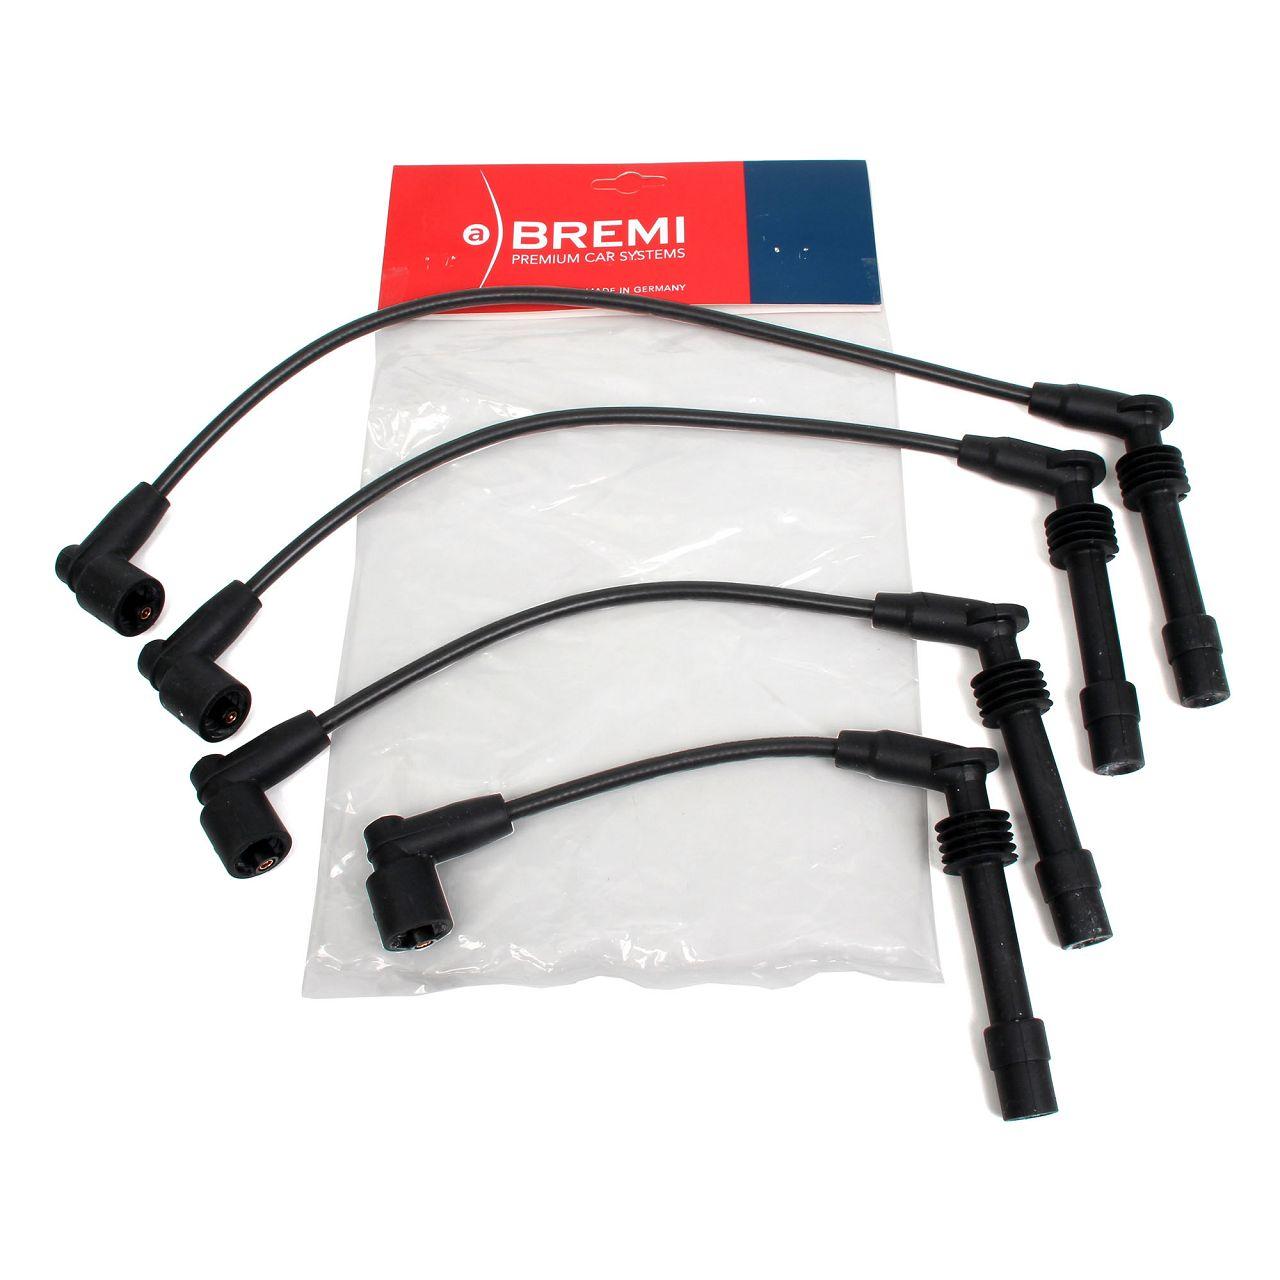 BREMI 300/678 Zündkabelsatz für OPEL ASTRA F CORSA B VECTRA A + B 1.2 1.4 1.6